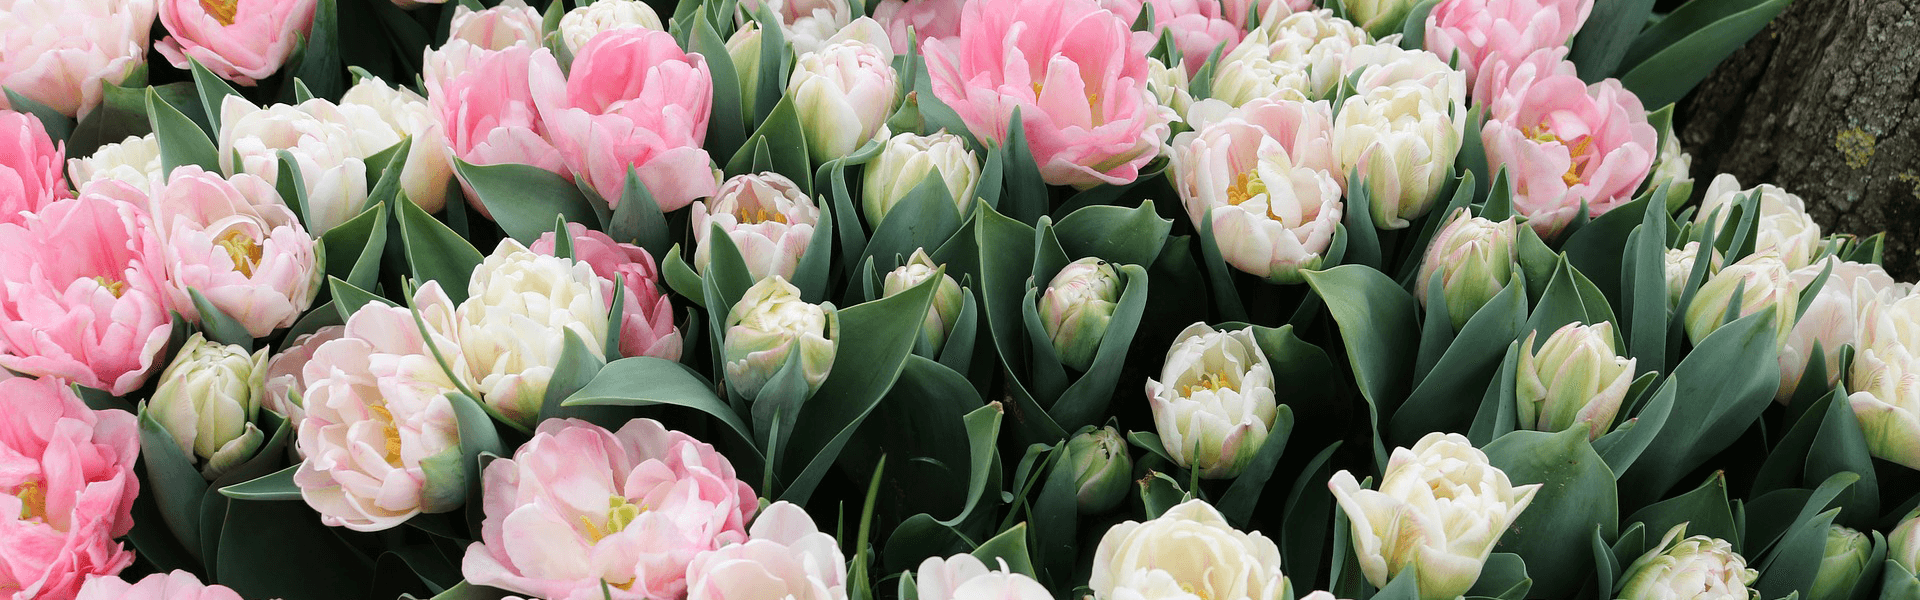 Kwiaciarnia Kaktus